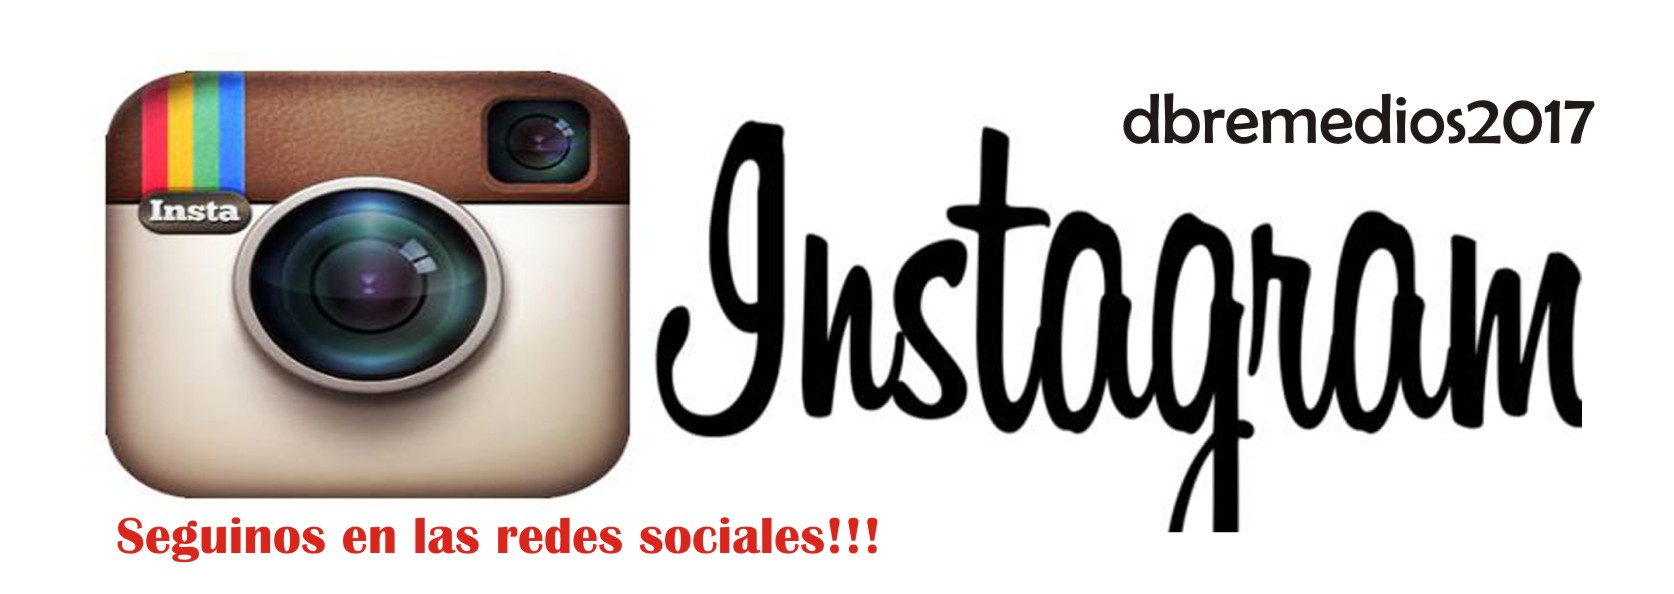 Instagram2017